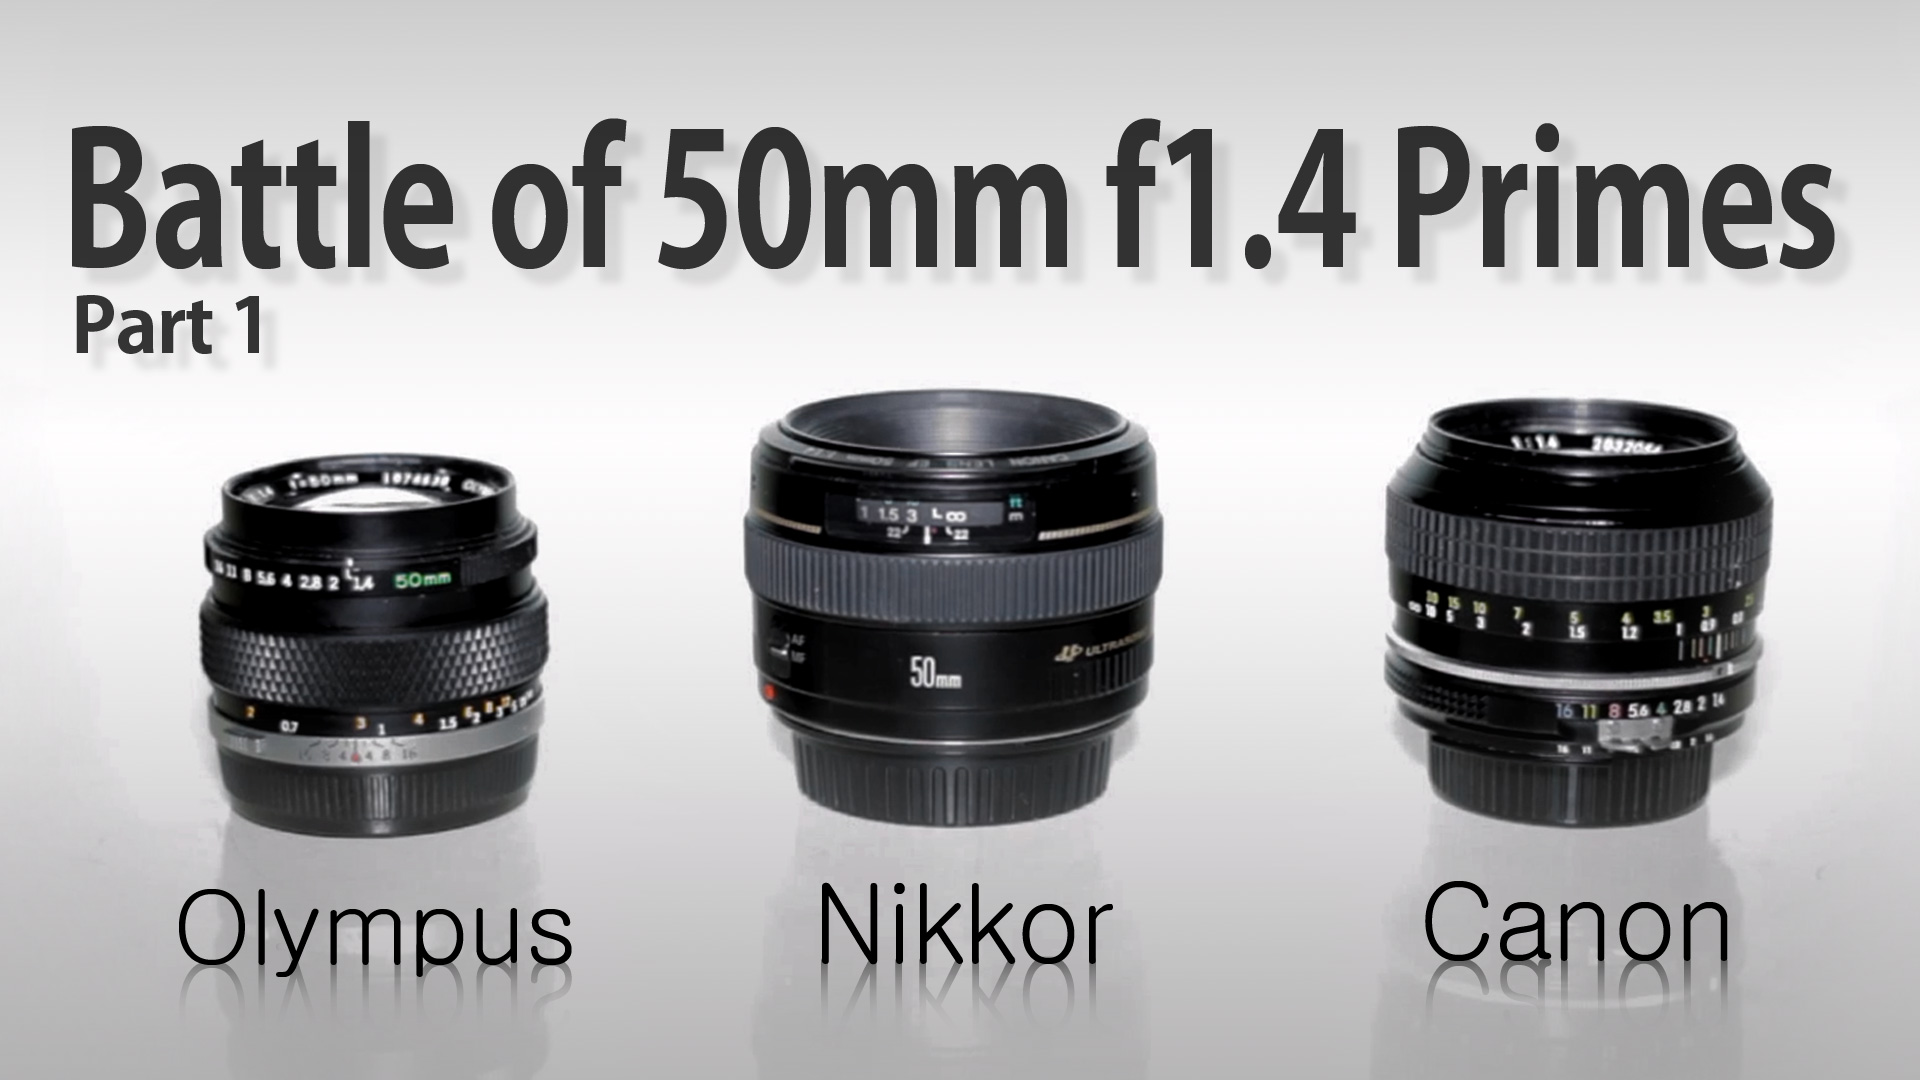 BATTLE of 50mm f/1.4 PRIMES. Olympus vs Canon vs Nikon